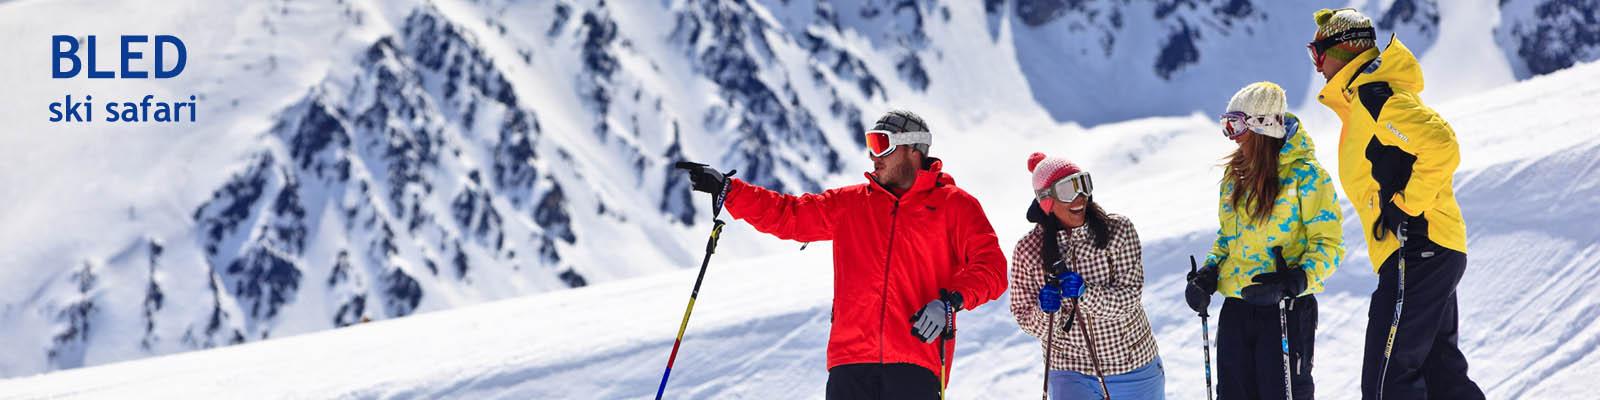 BLED ski safari baner